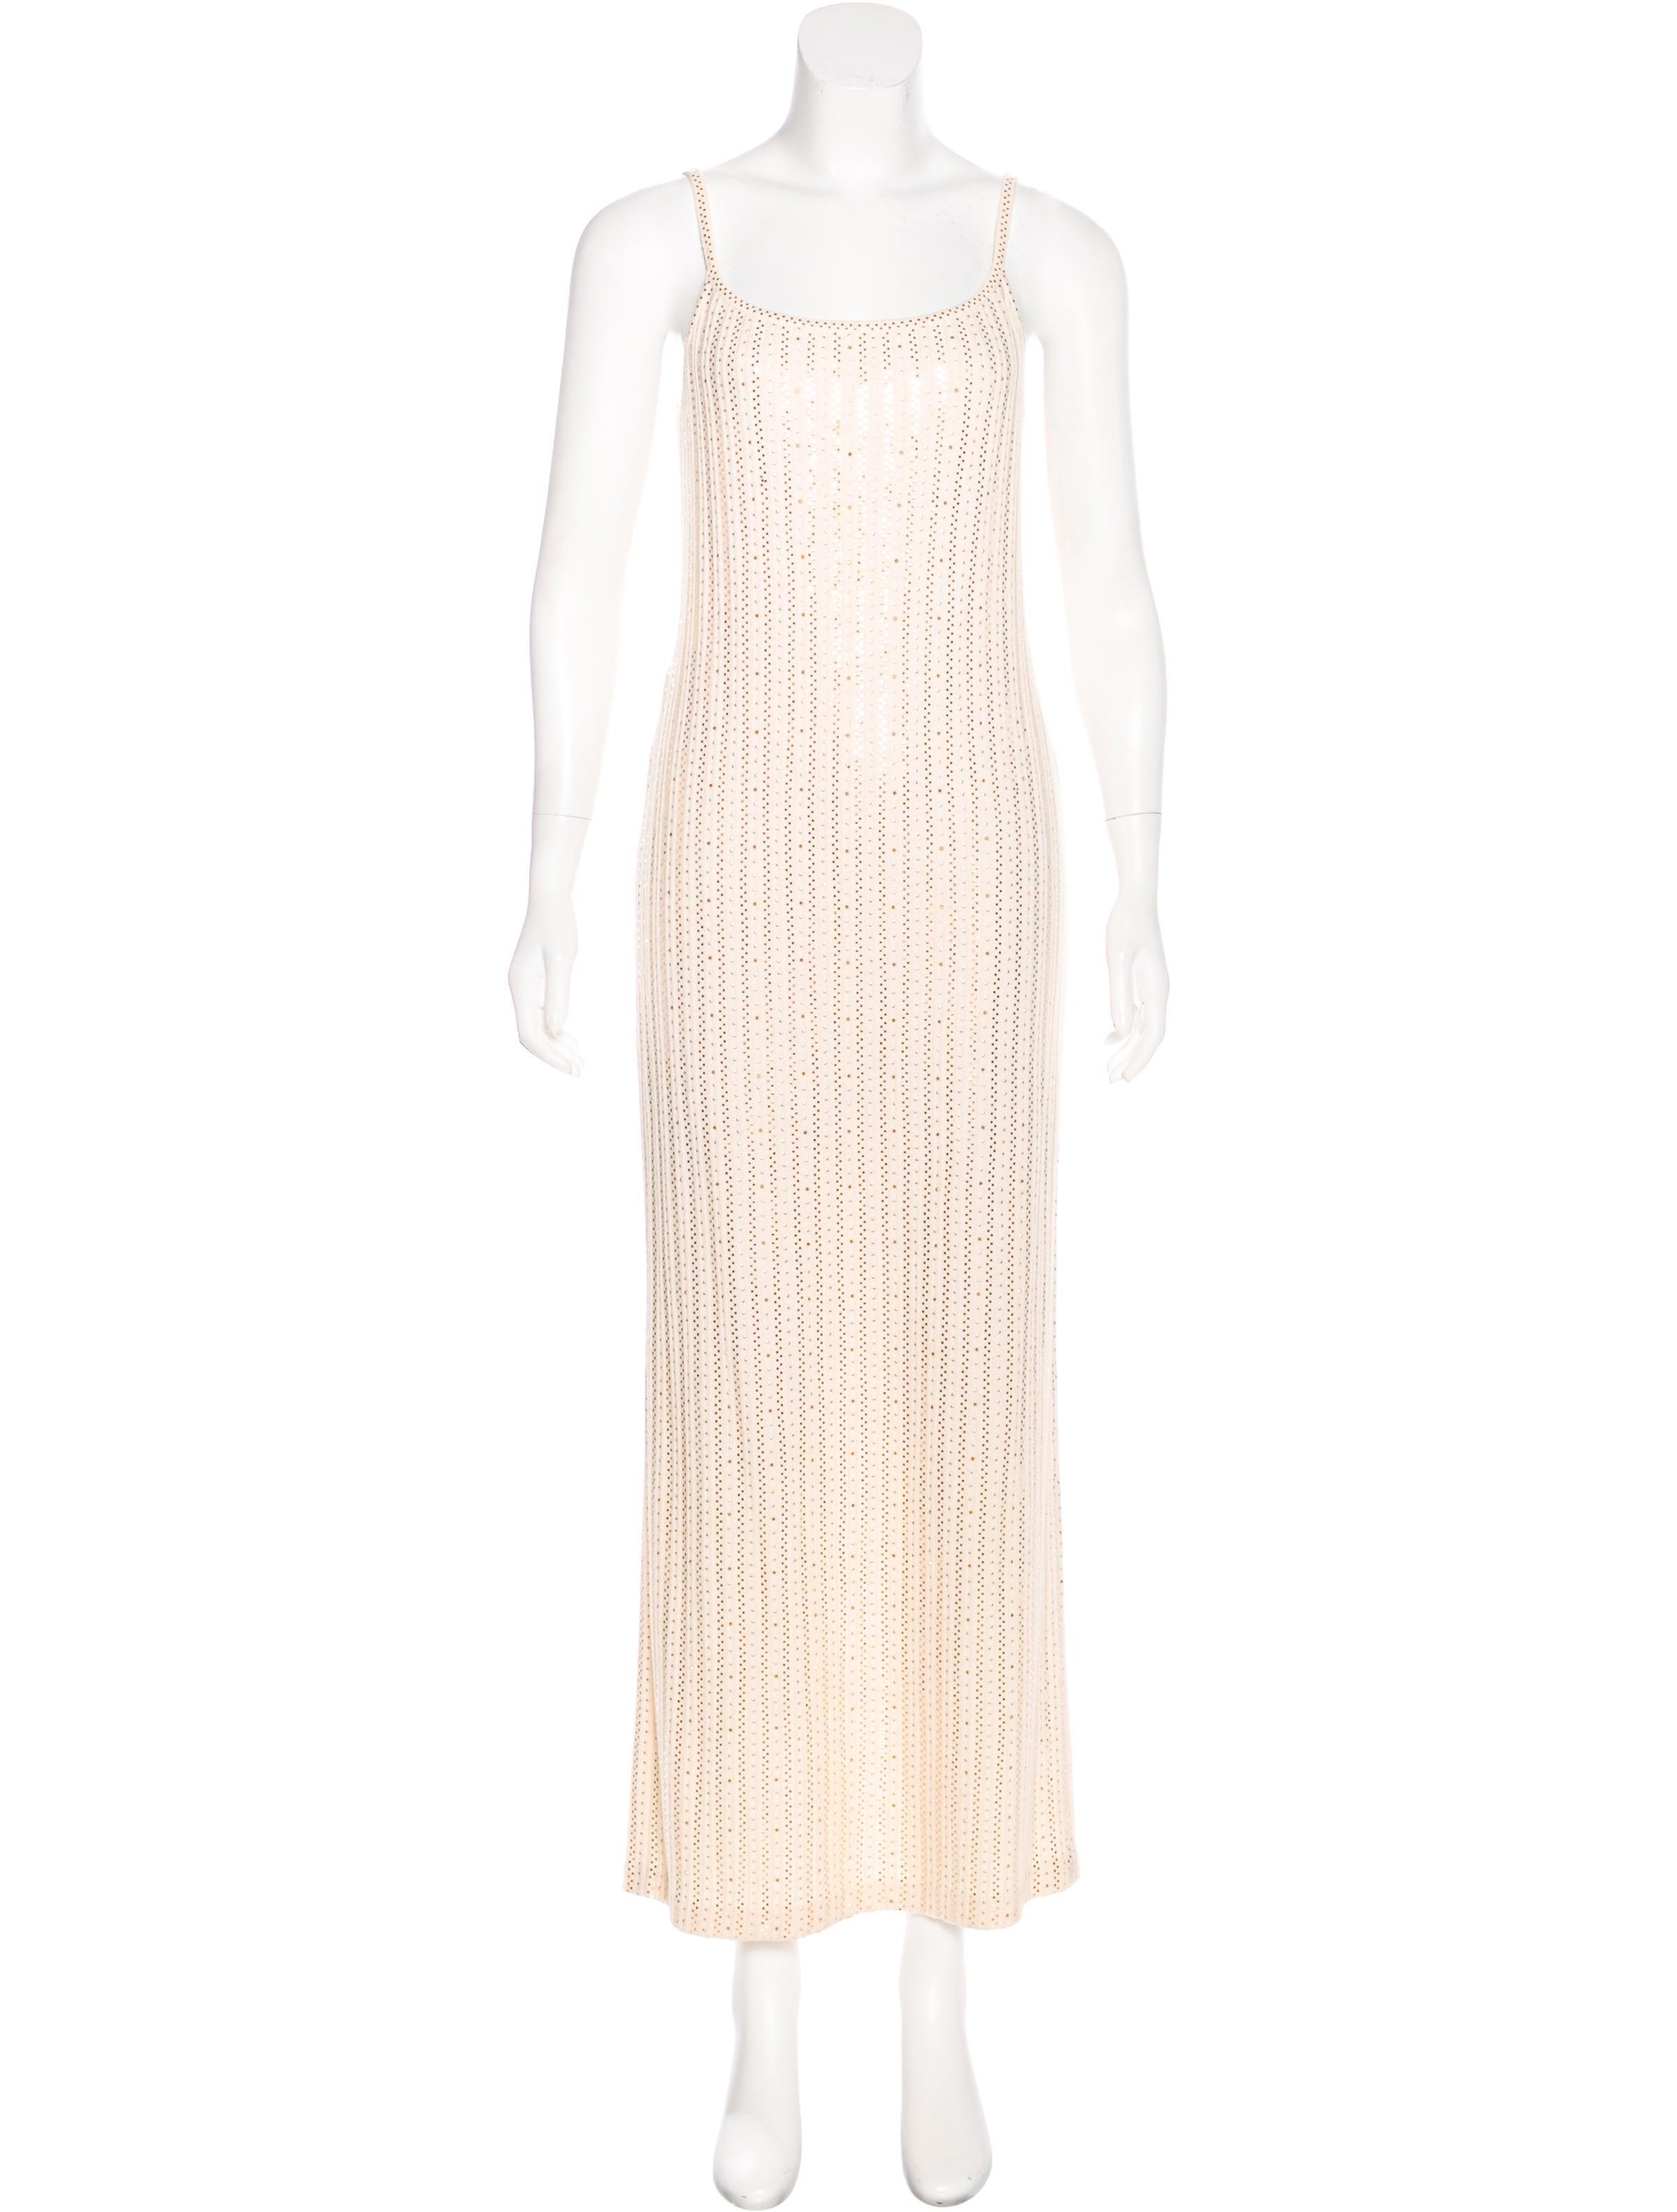 St. John Sequin Evening Dress - Clothing - STJ22608 | The RealReal